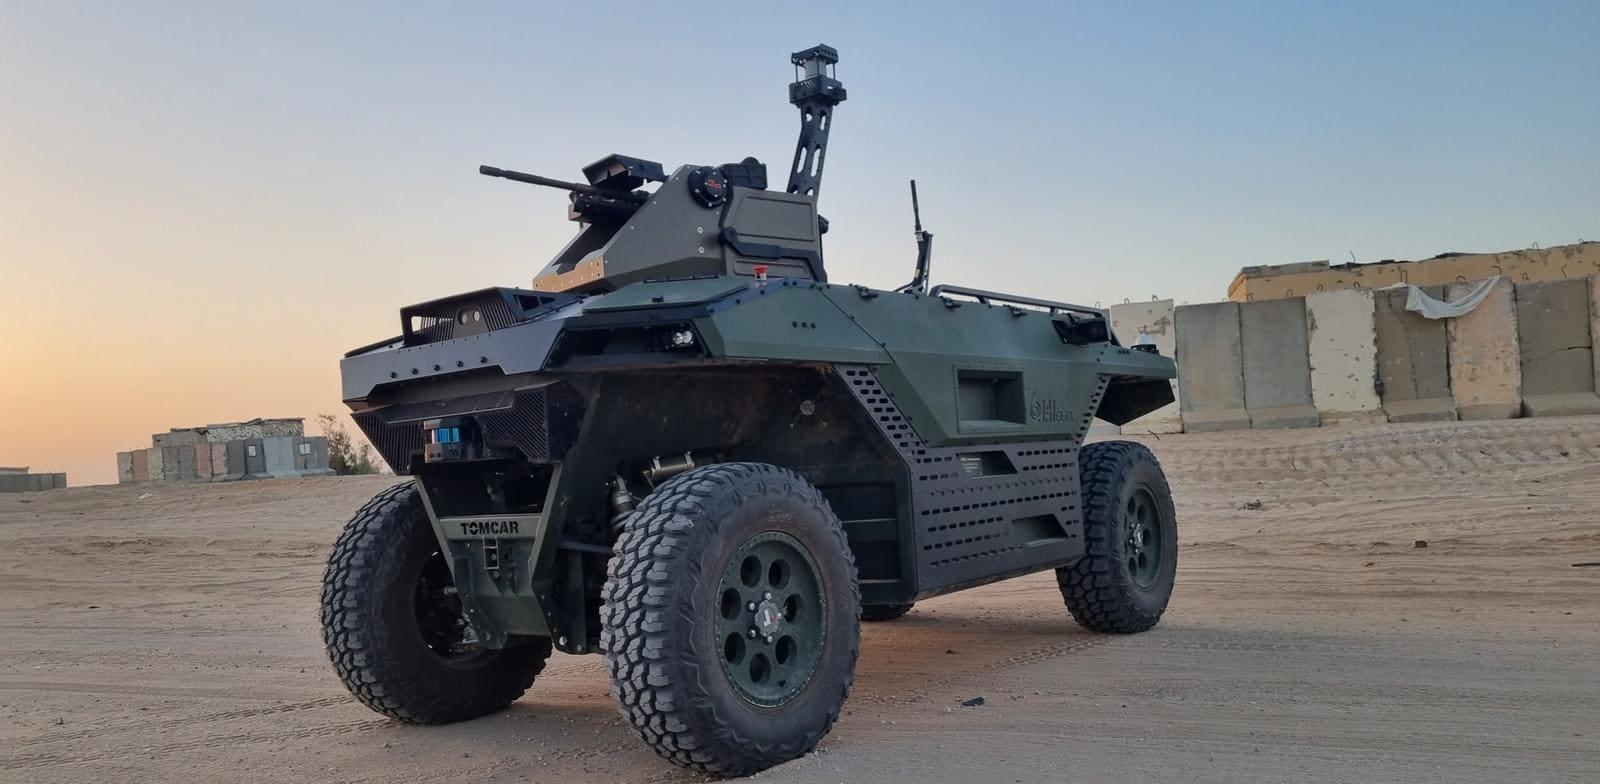 IAI Rex Mk2 autonomous vehicle  credit: IAI